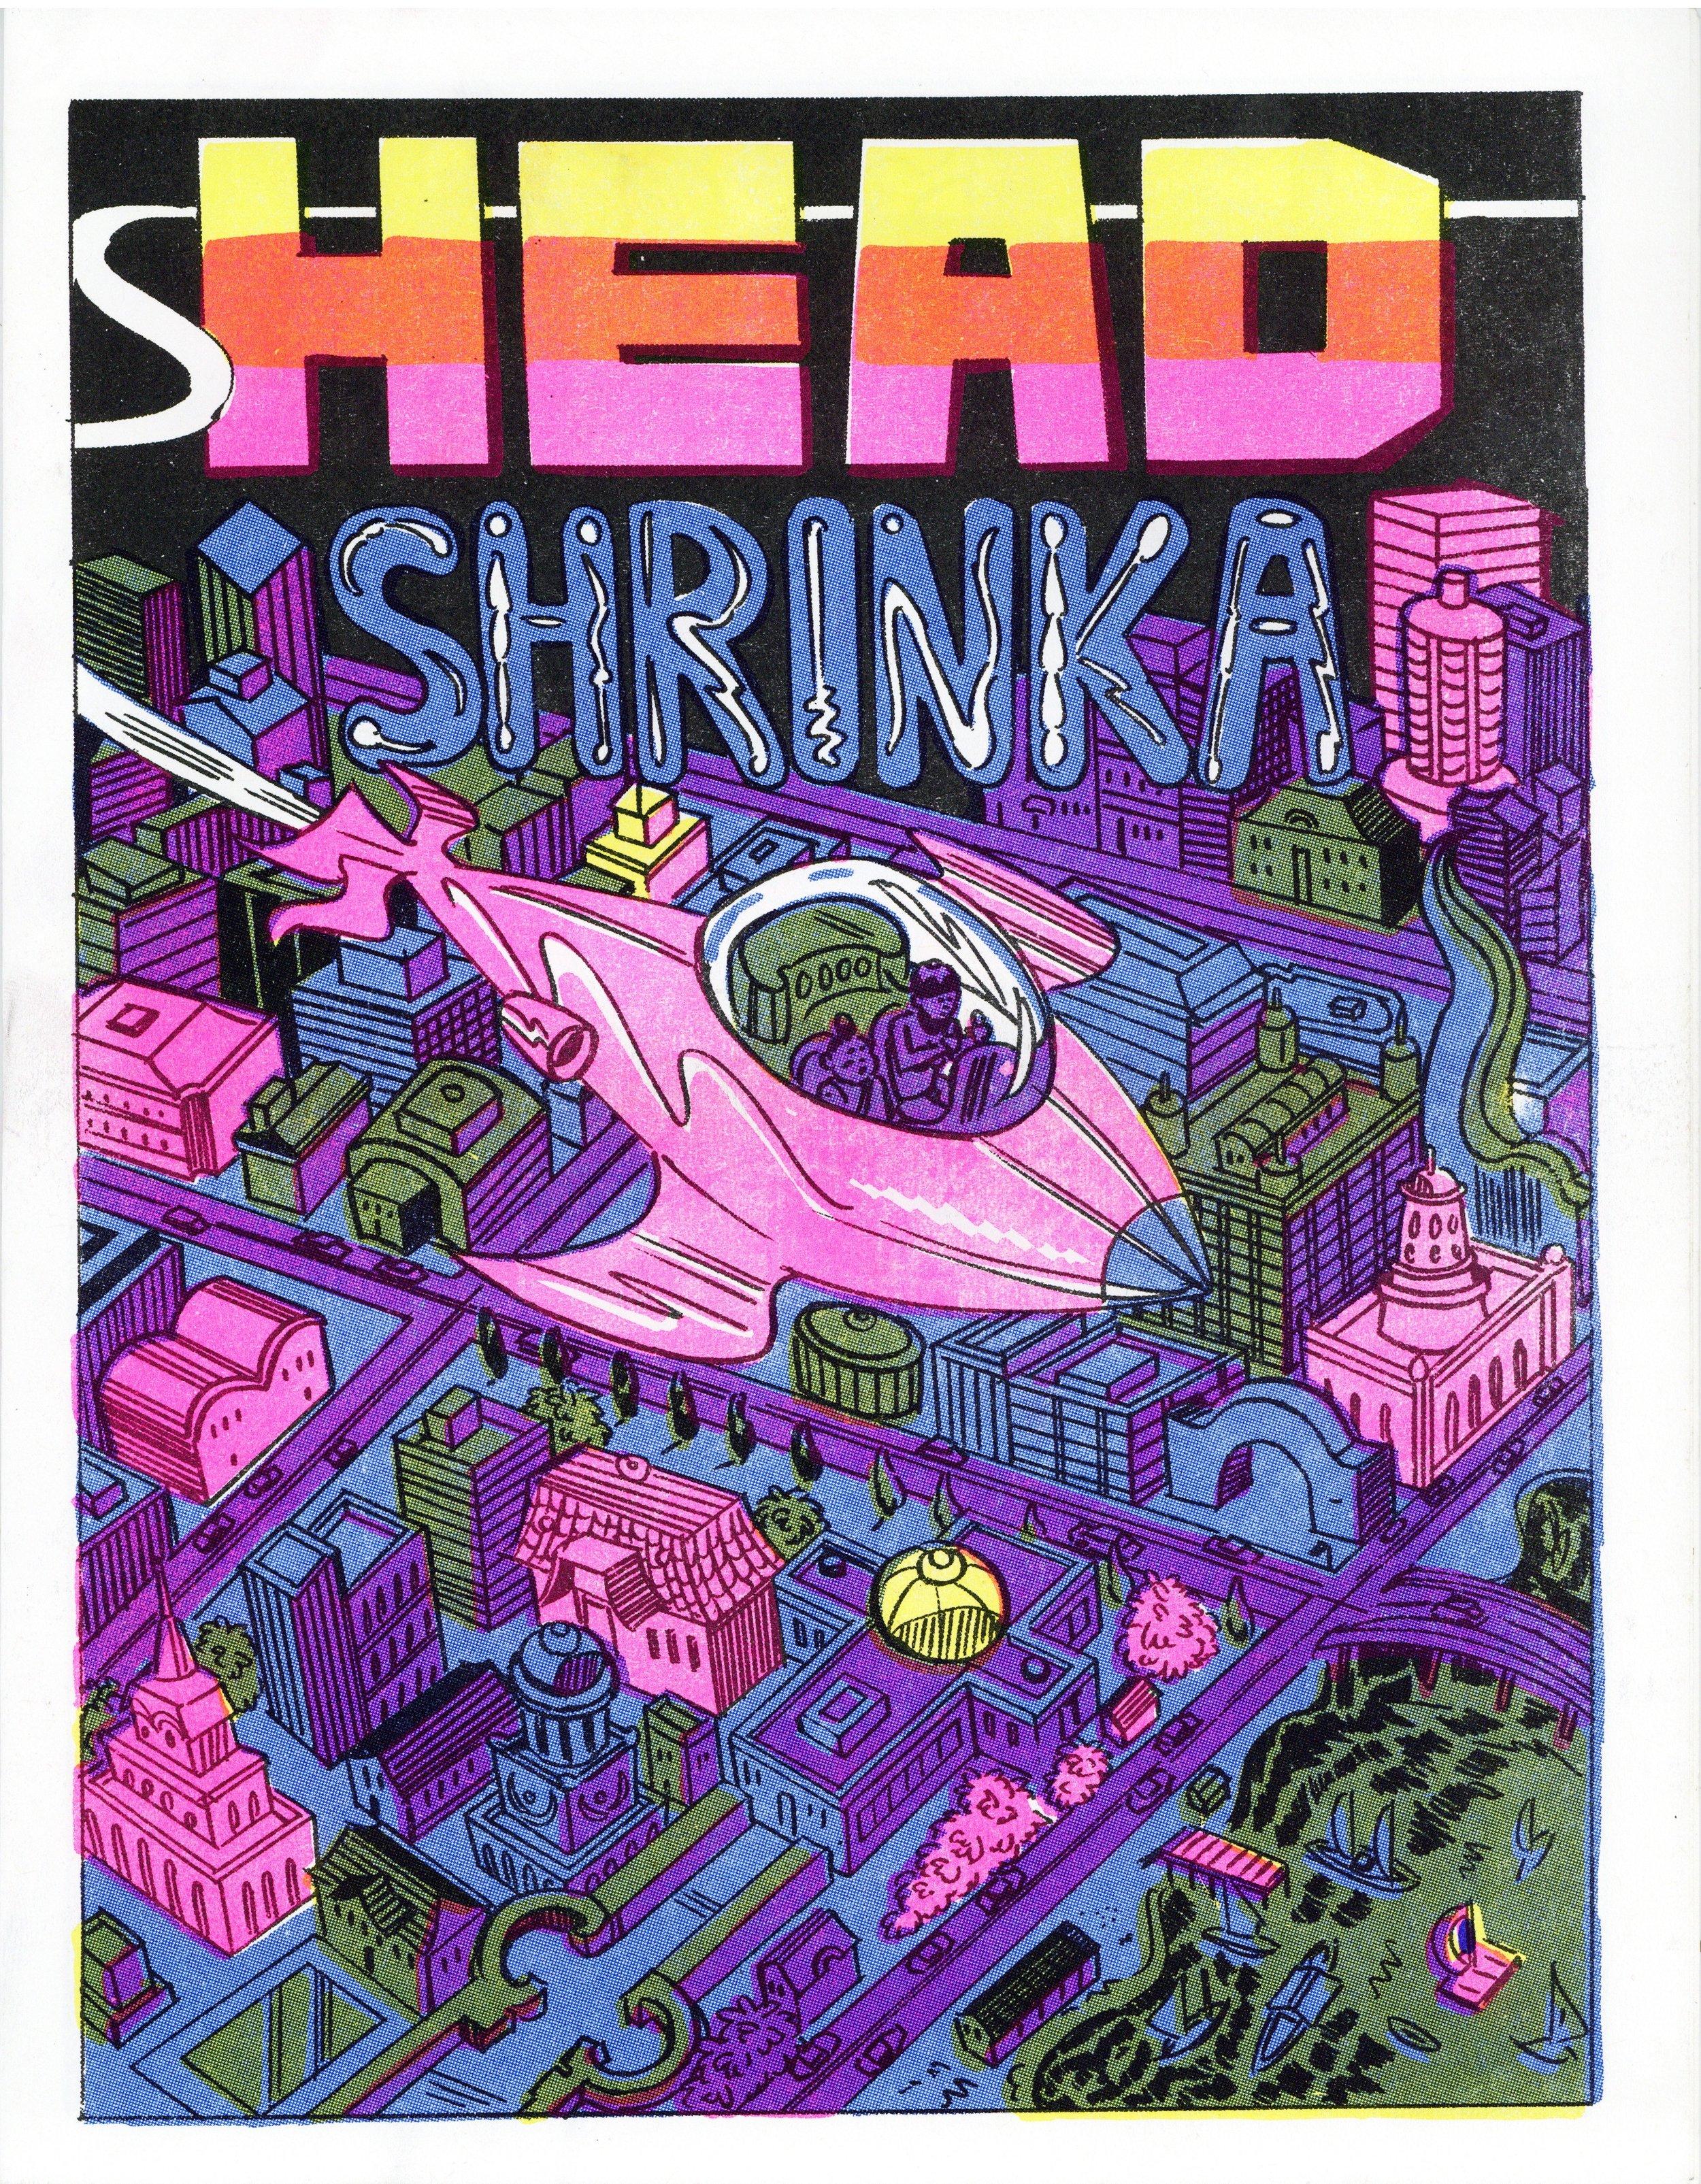 headshrinka2.jpg